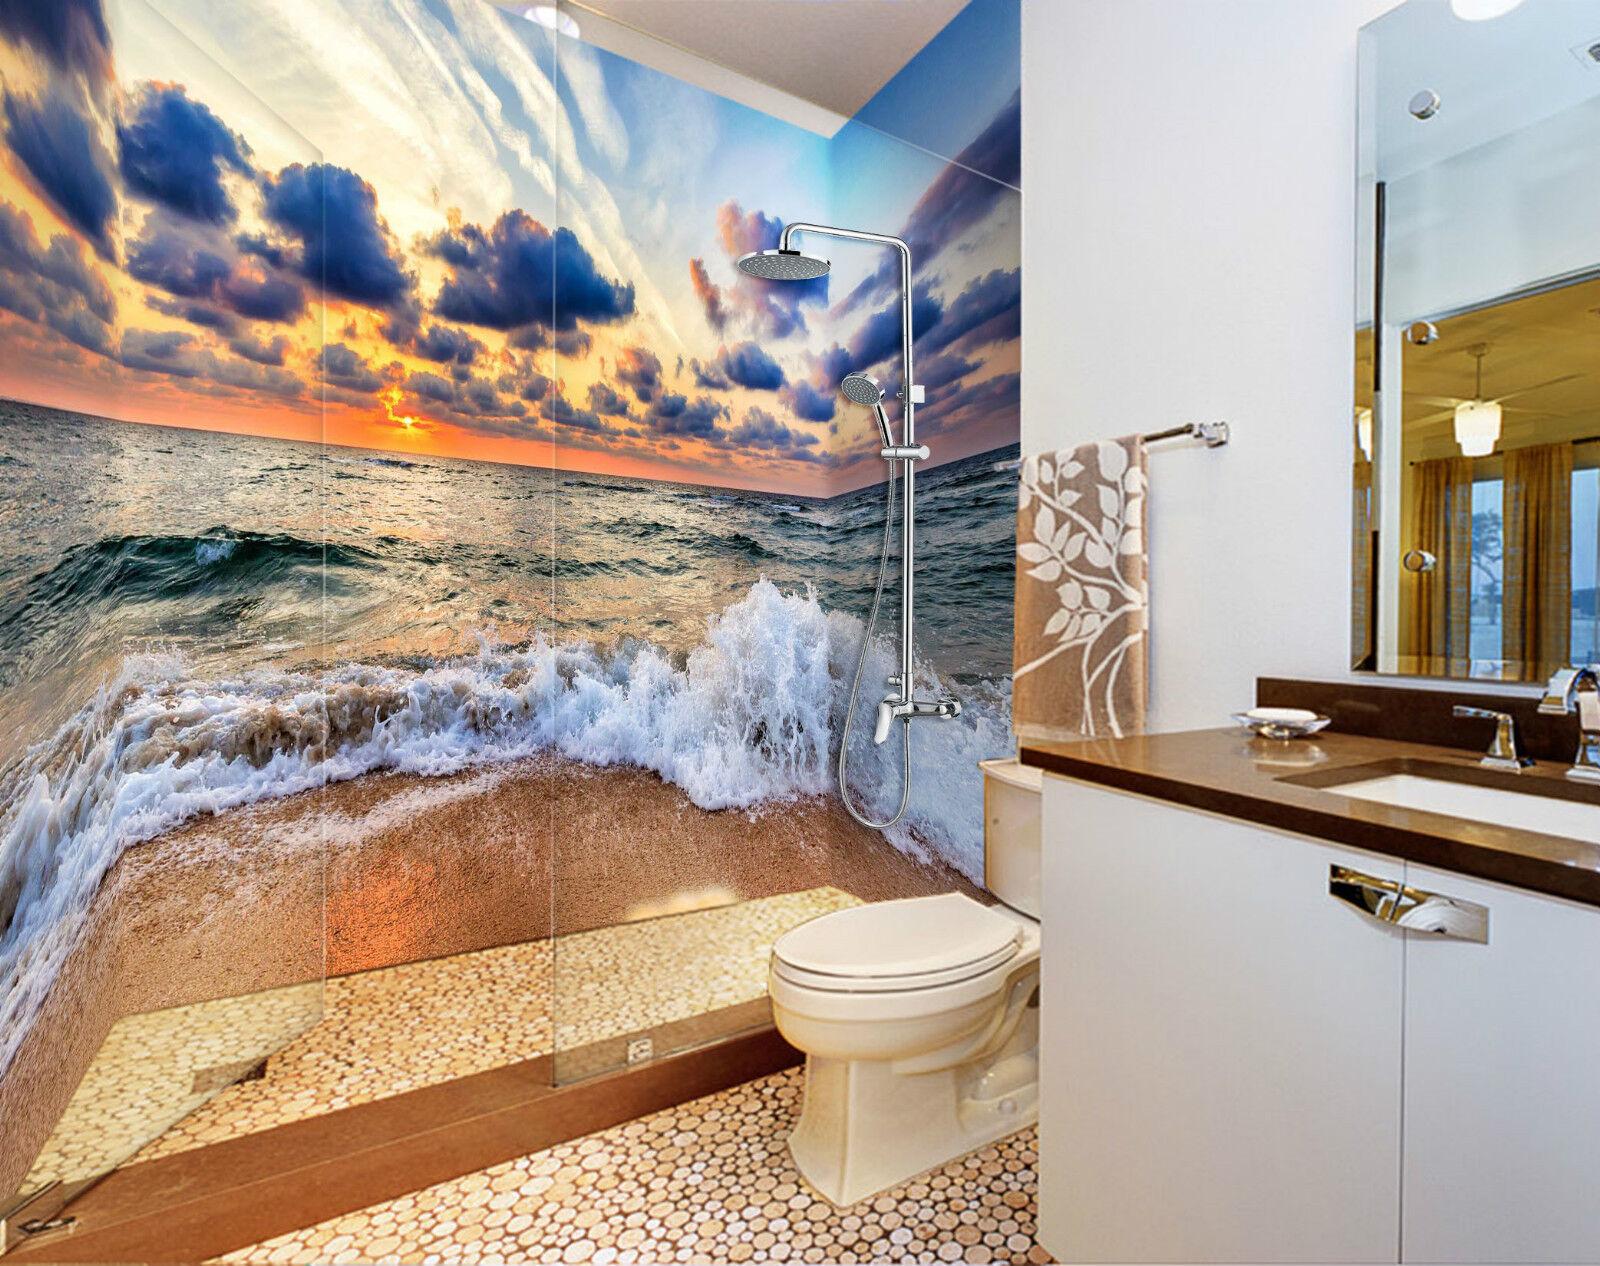 3D Sea Sunset Glow 120 WallPaper Bathroom Print Decal Wall Deco AJ WALLPAPER CA